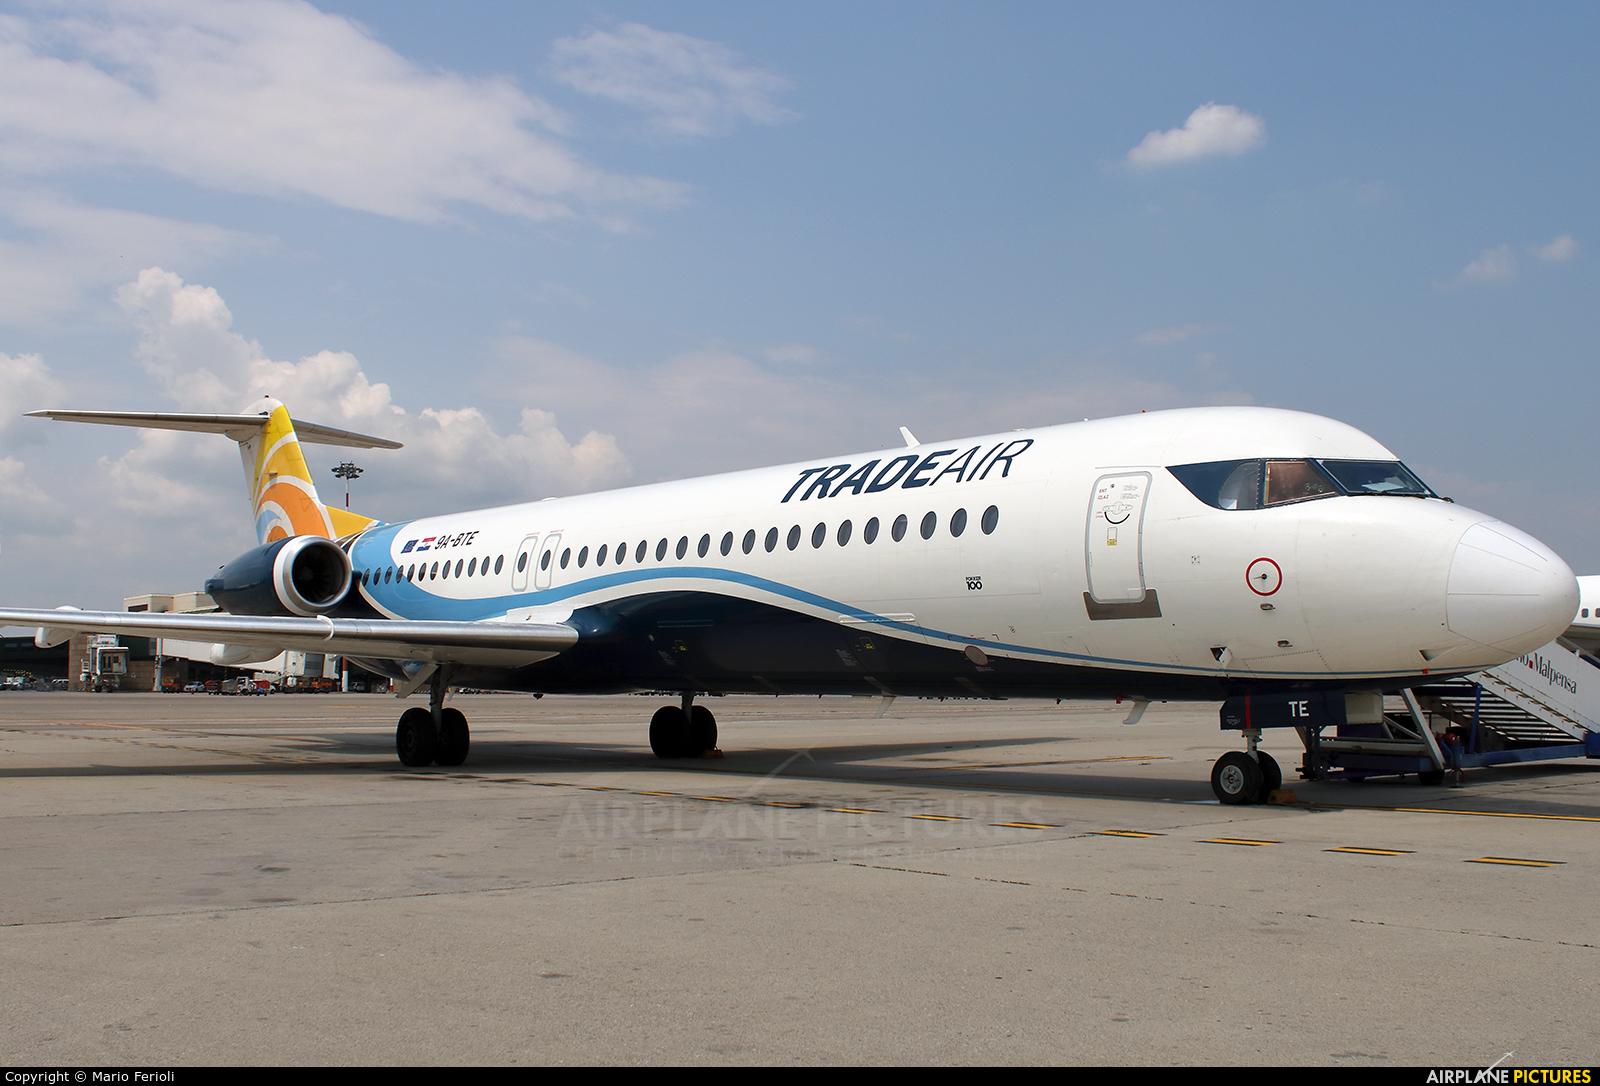 Trade Air 9A-BTE aircraft at Milan - Malpensa